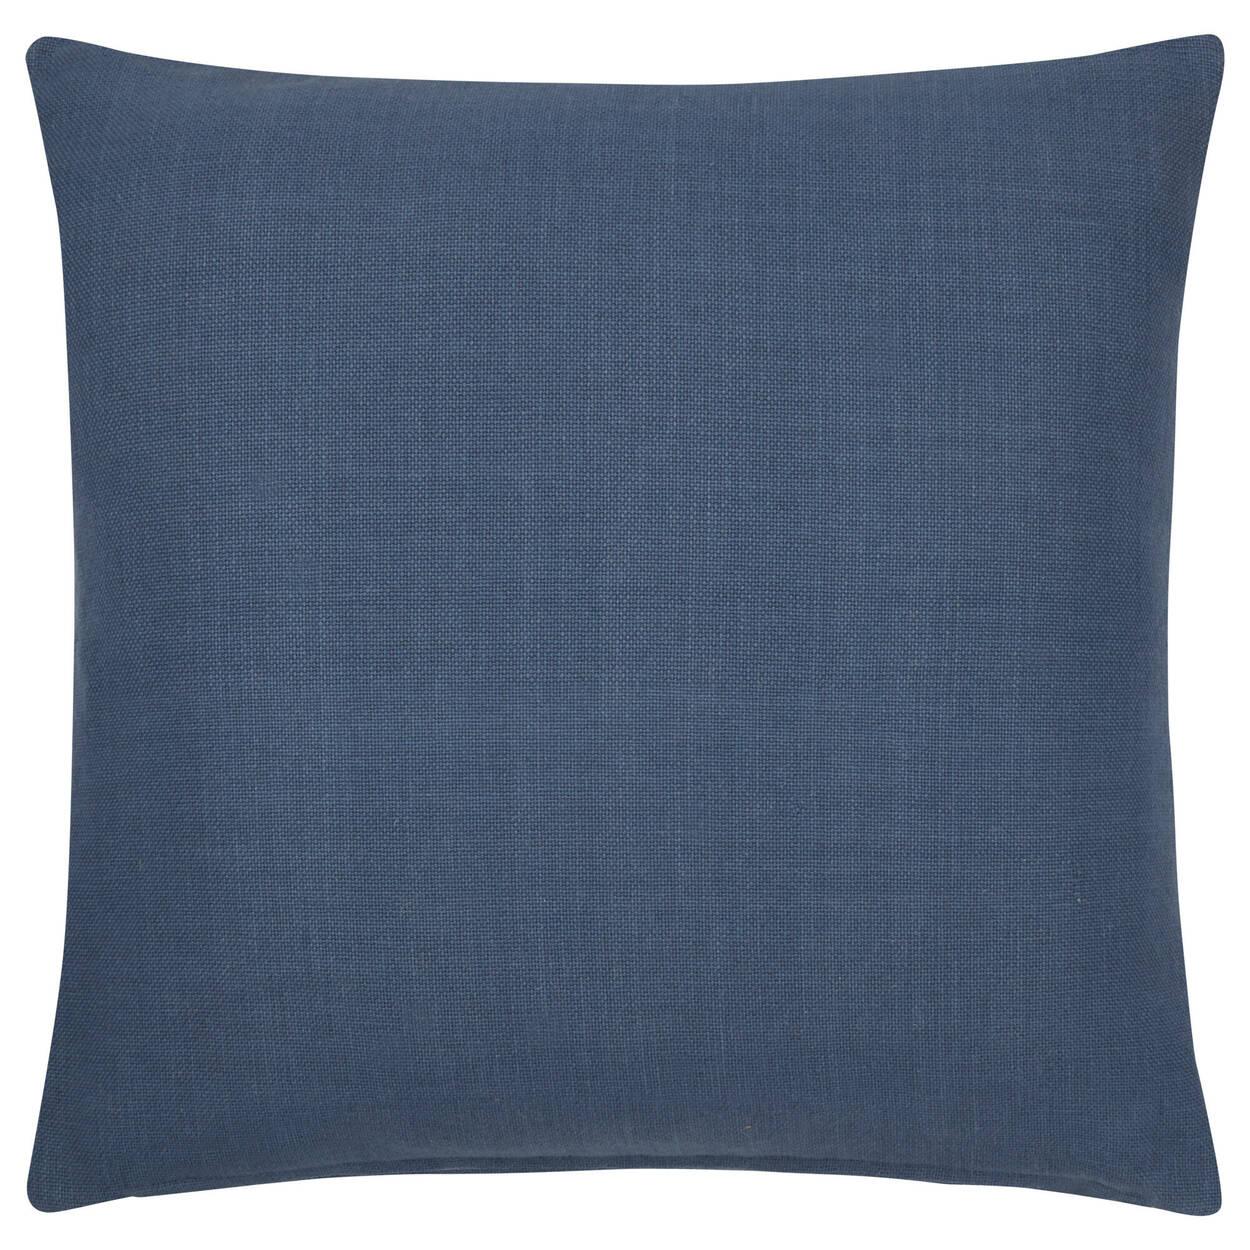 "Lawrence Decorative Pillow 20"" x 20"""